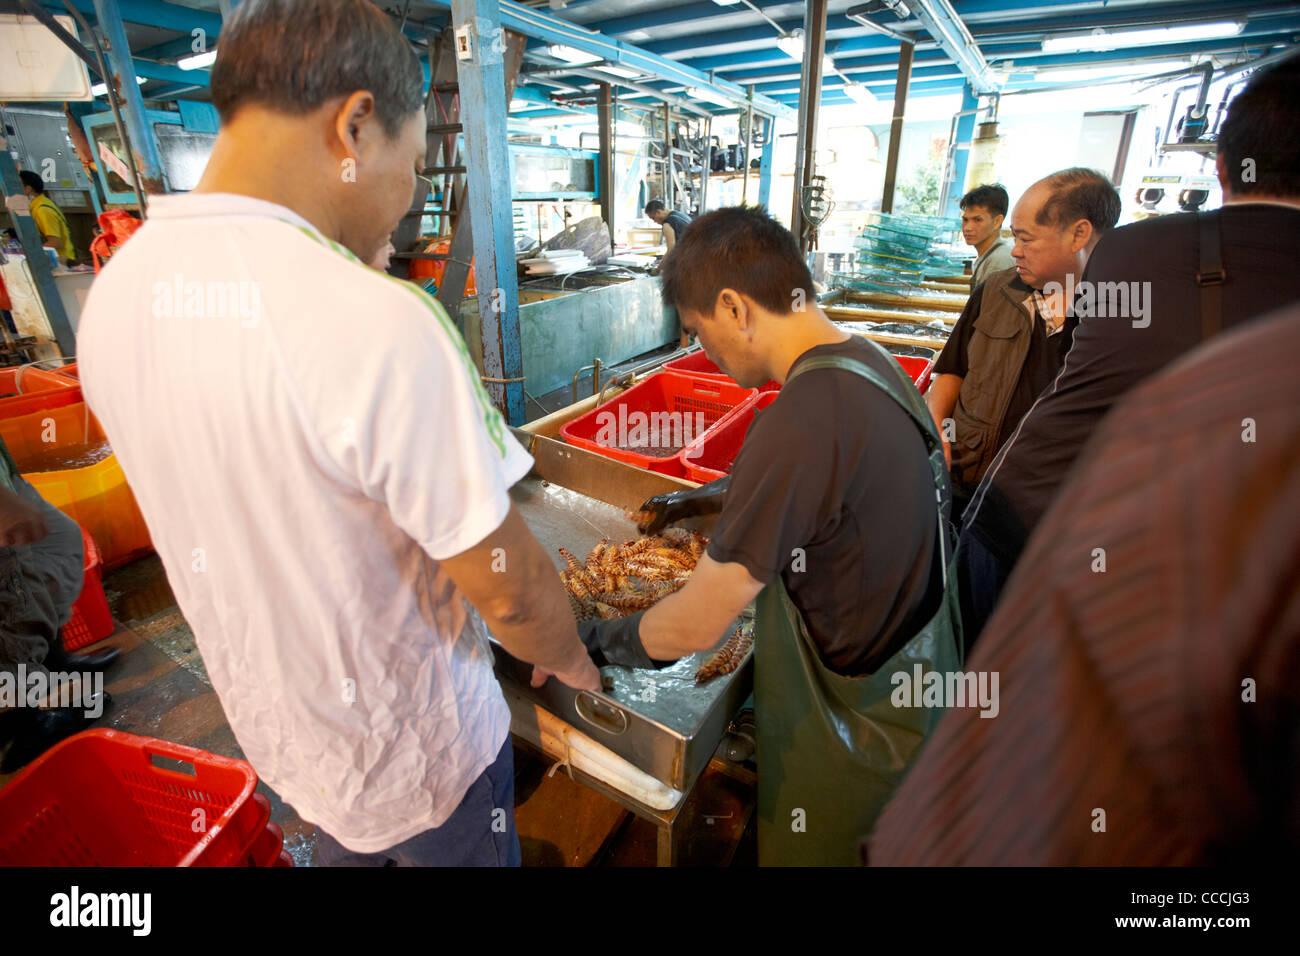 workers sorting and grading striped tiger prawns at aberdeen wholesale fish and seafood market hong kong hksar china - Stock Image